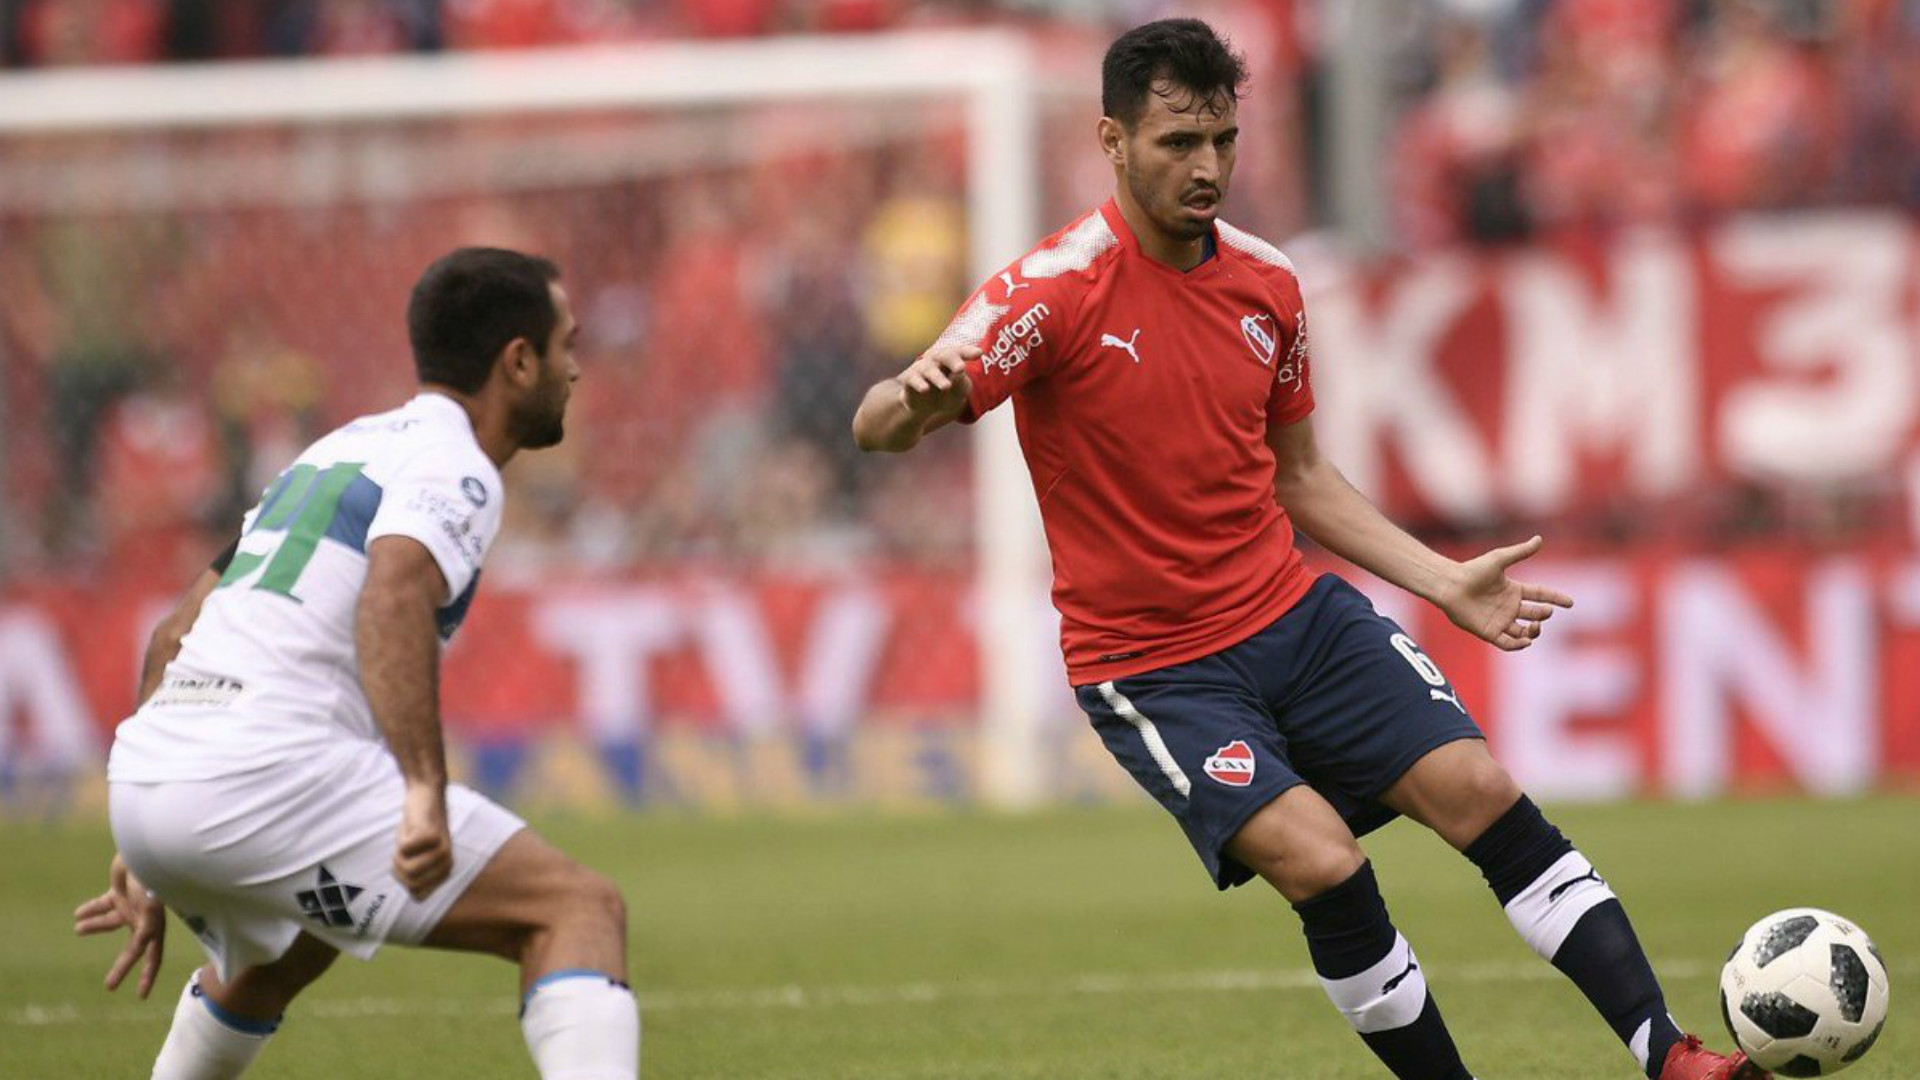 Juan Sanchez Miño Independiente Gimnasia Superliga Argentina 06052018